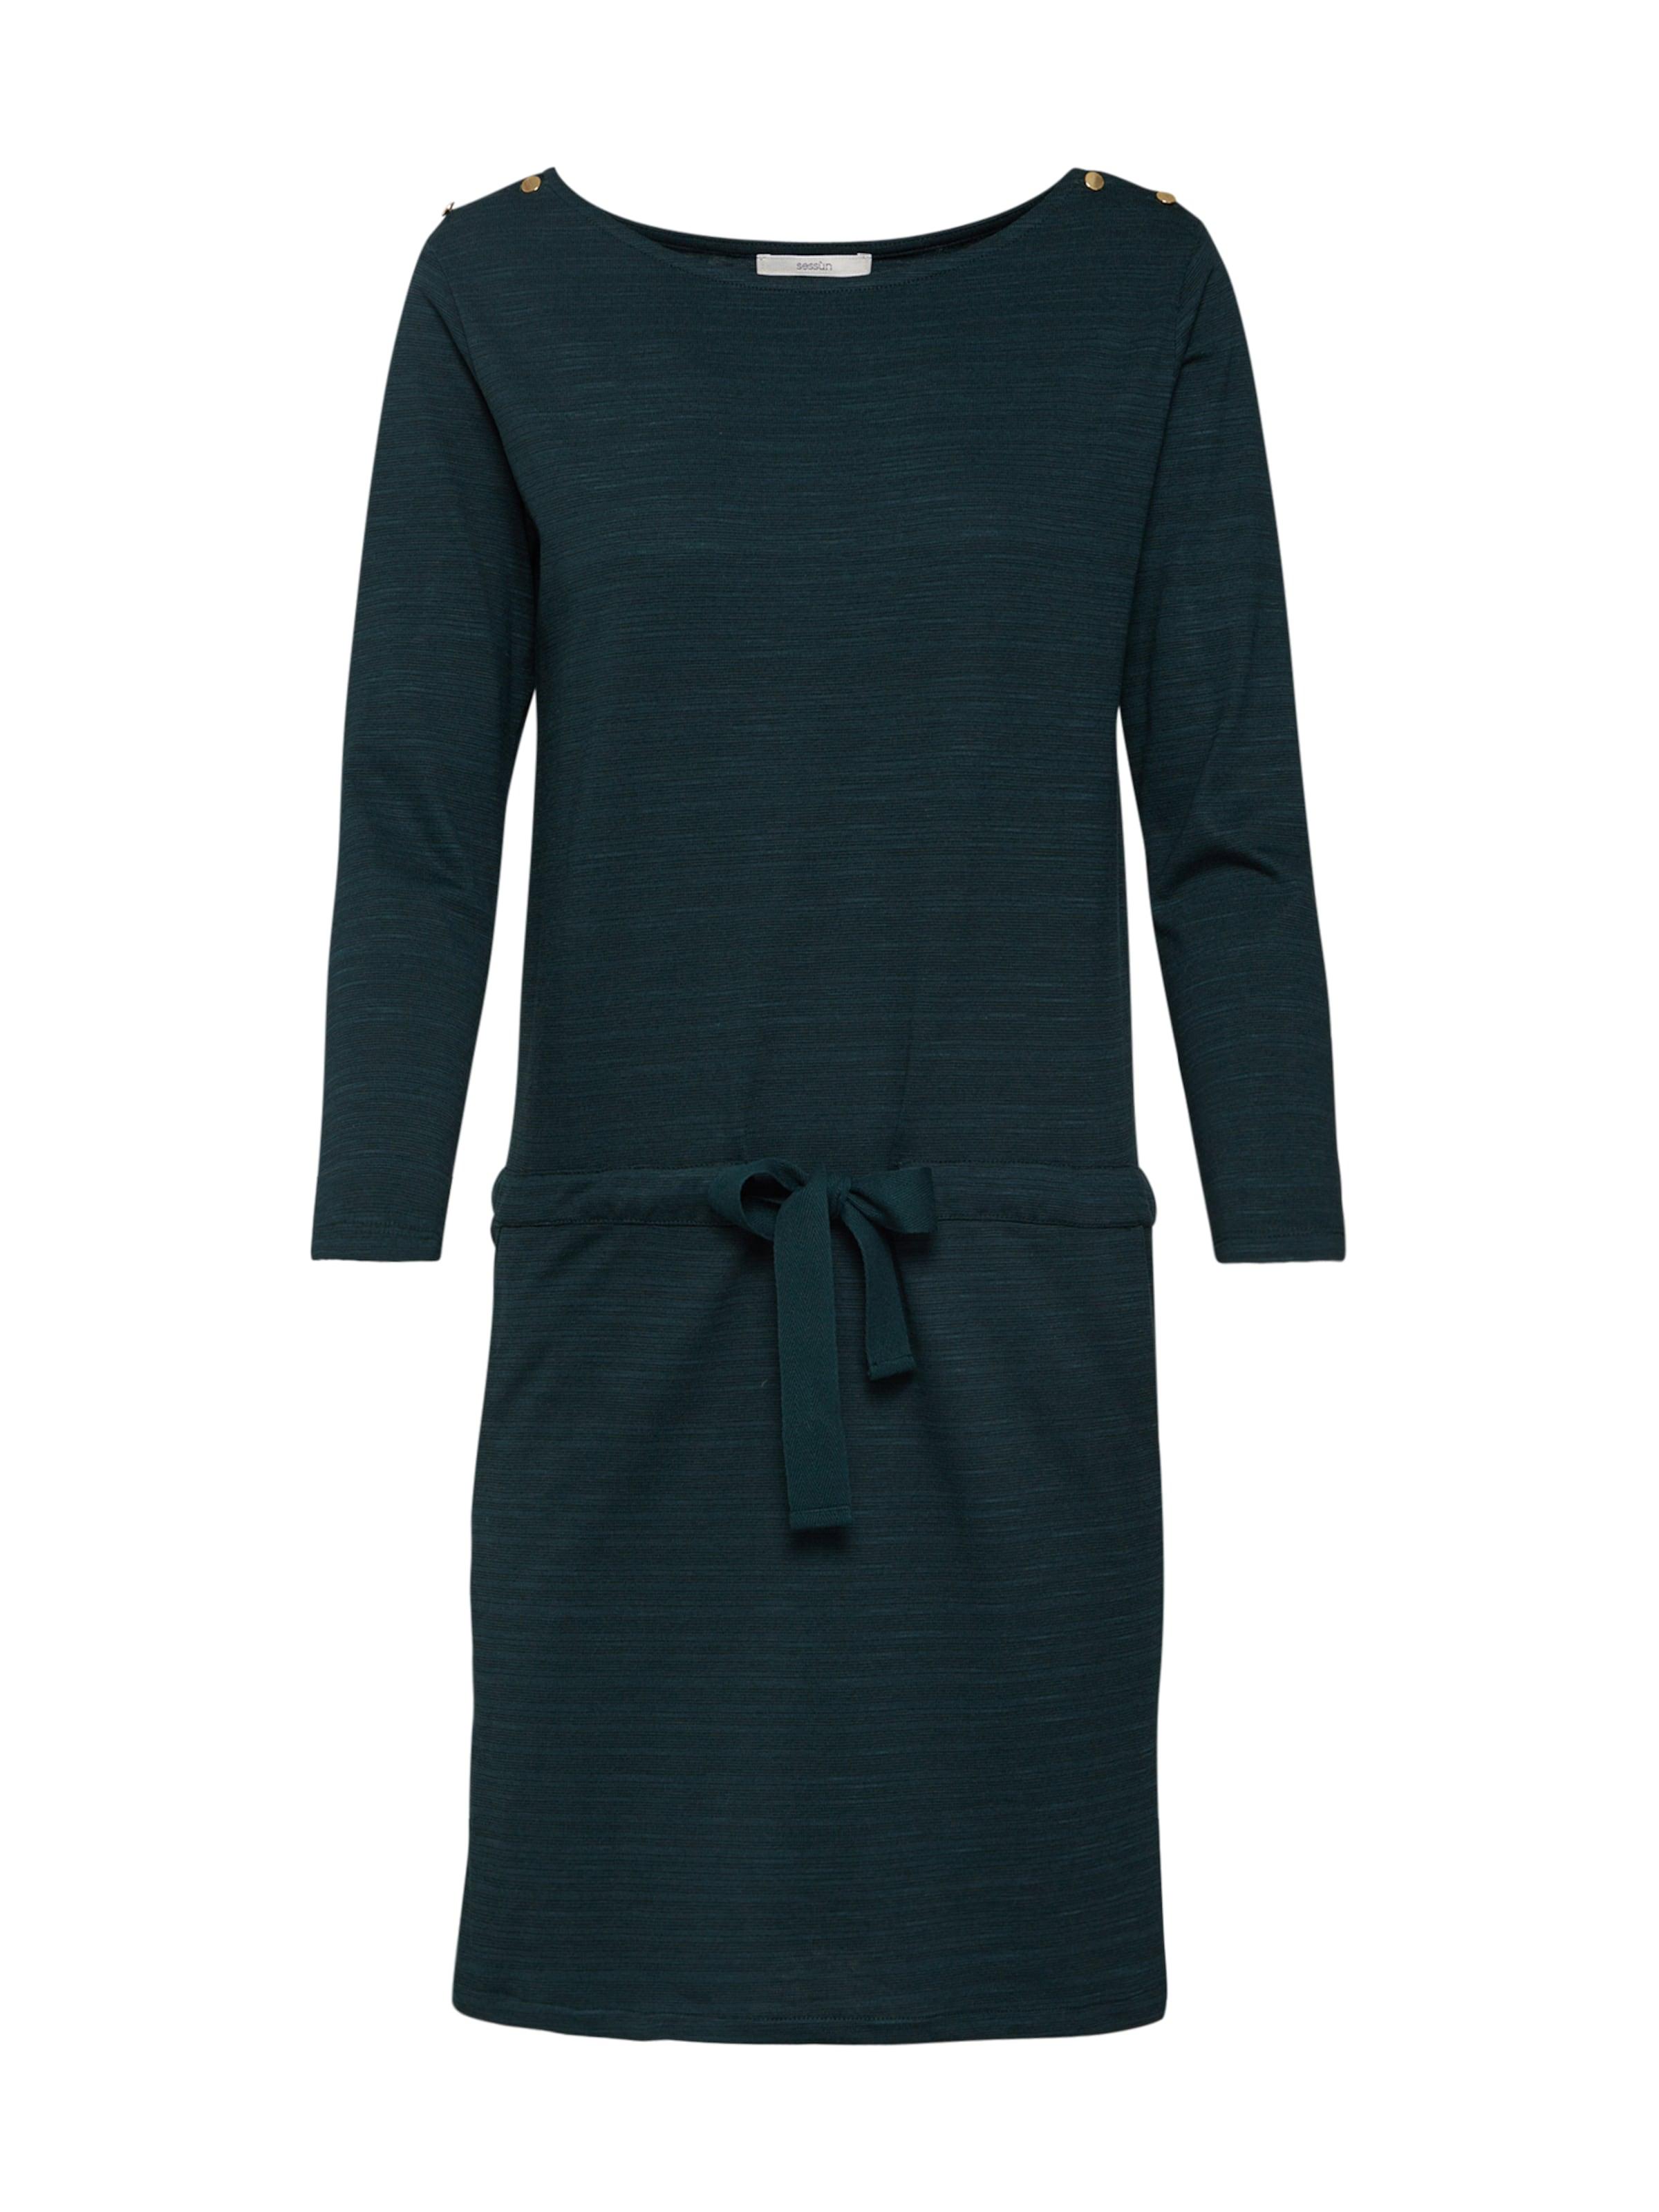 Smaragd Nishi' 'nu Sessun Kleid In JFT1Kc3l